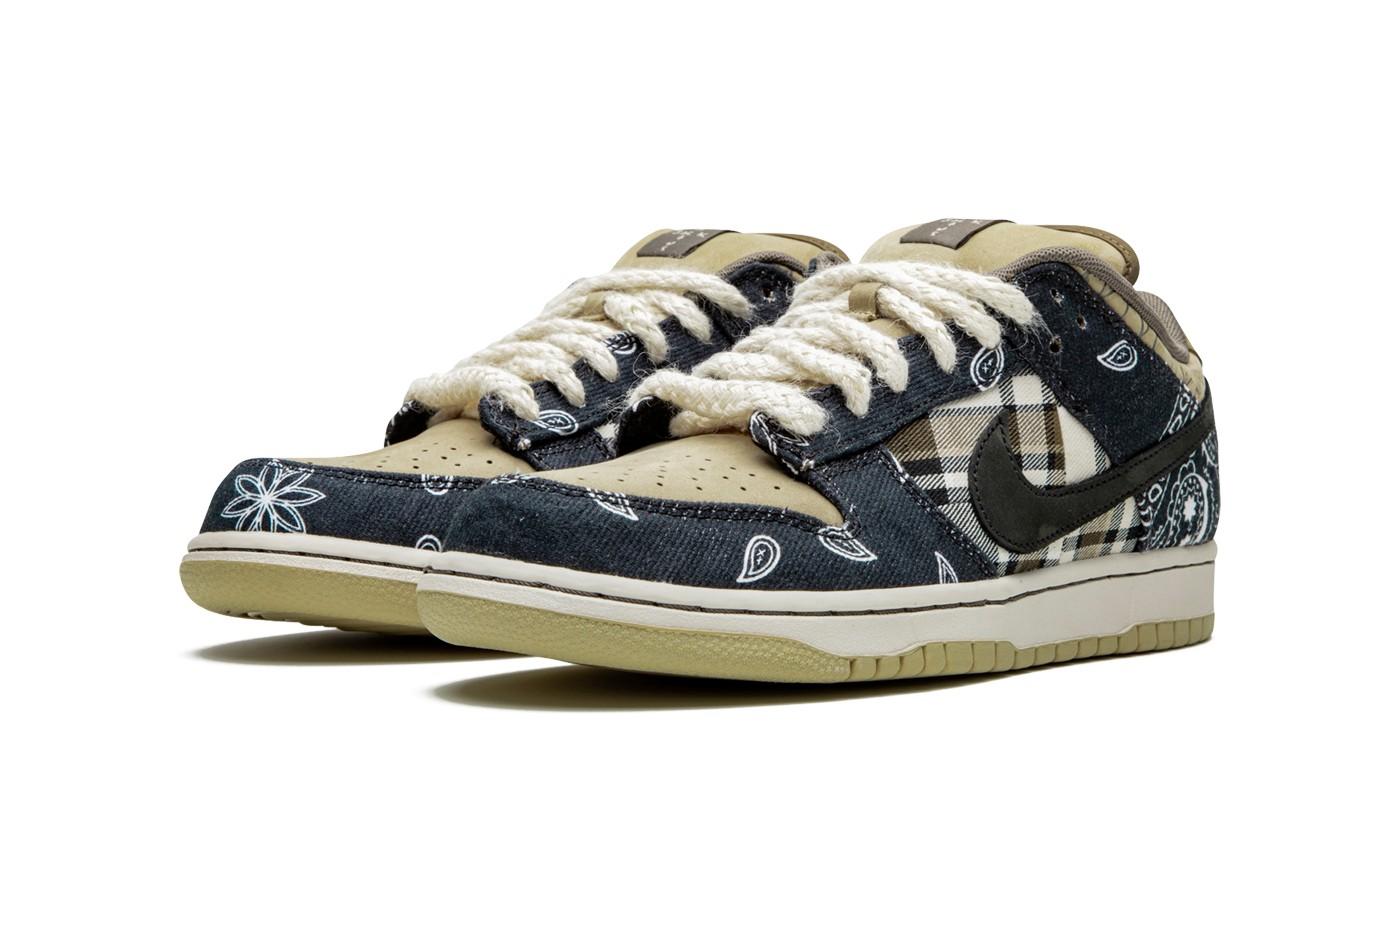 "A Closer Look At The Travis Scott x Nike SB Dunk Low ""Cactus Jack"""